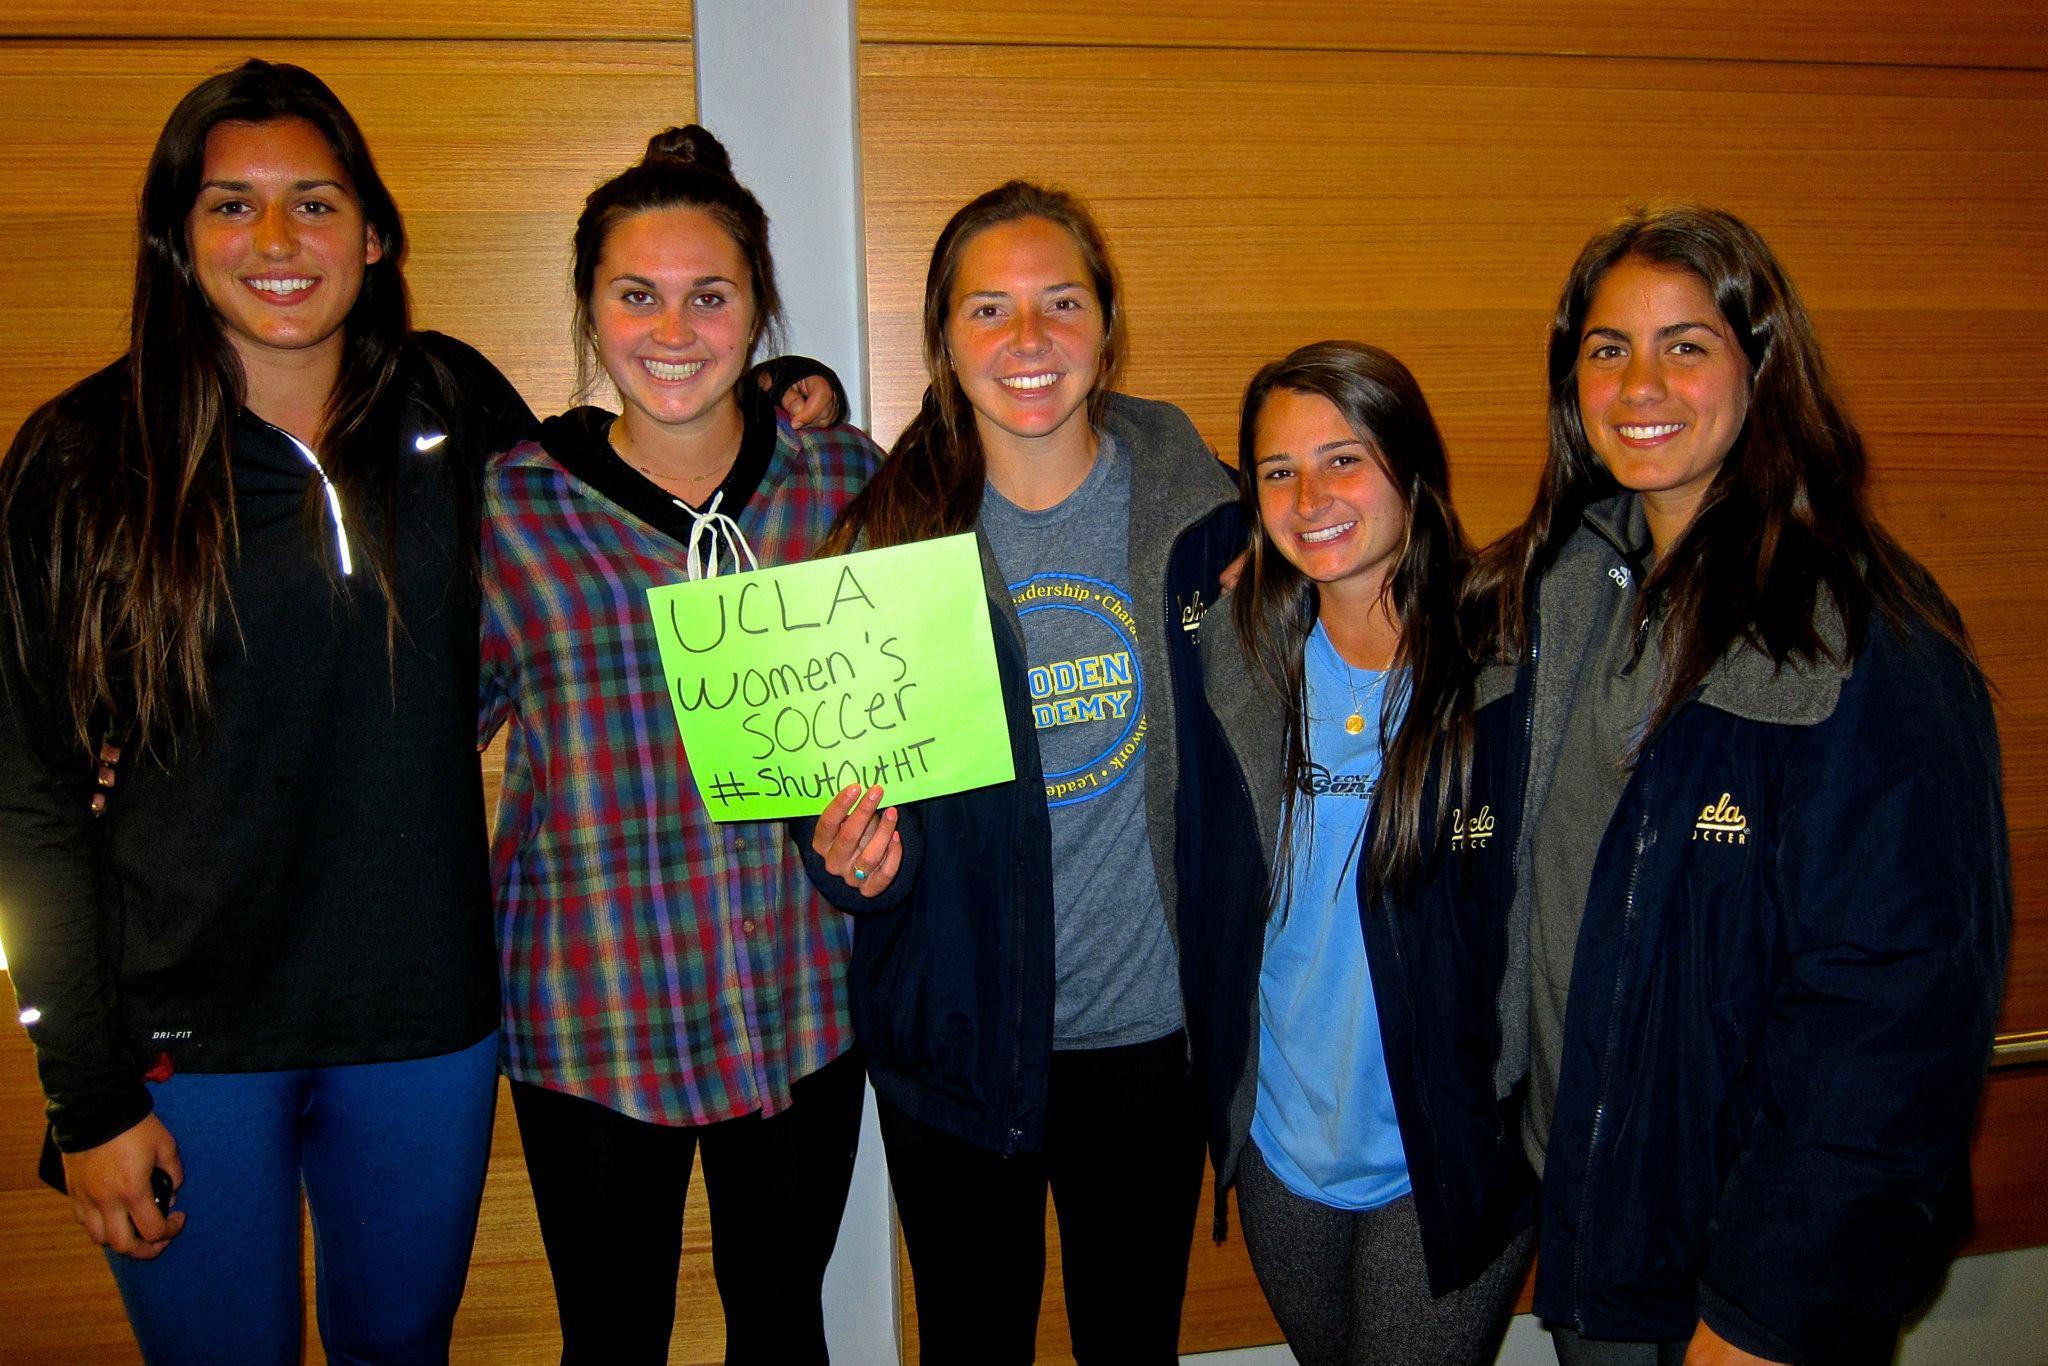 UCLA Women's Soccer Team participates in the #ShutOutHT photo campaign. Photo credit: Esha Jalota